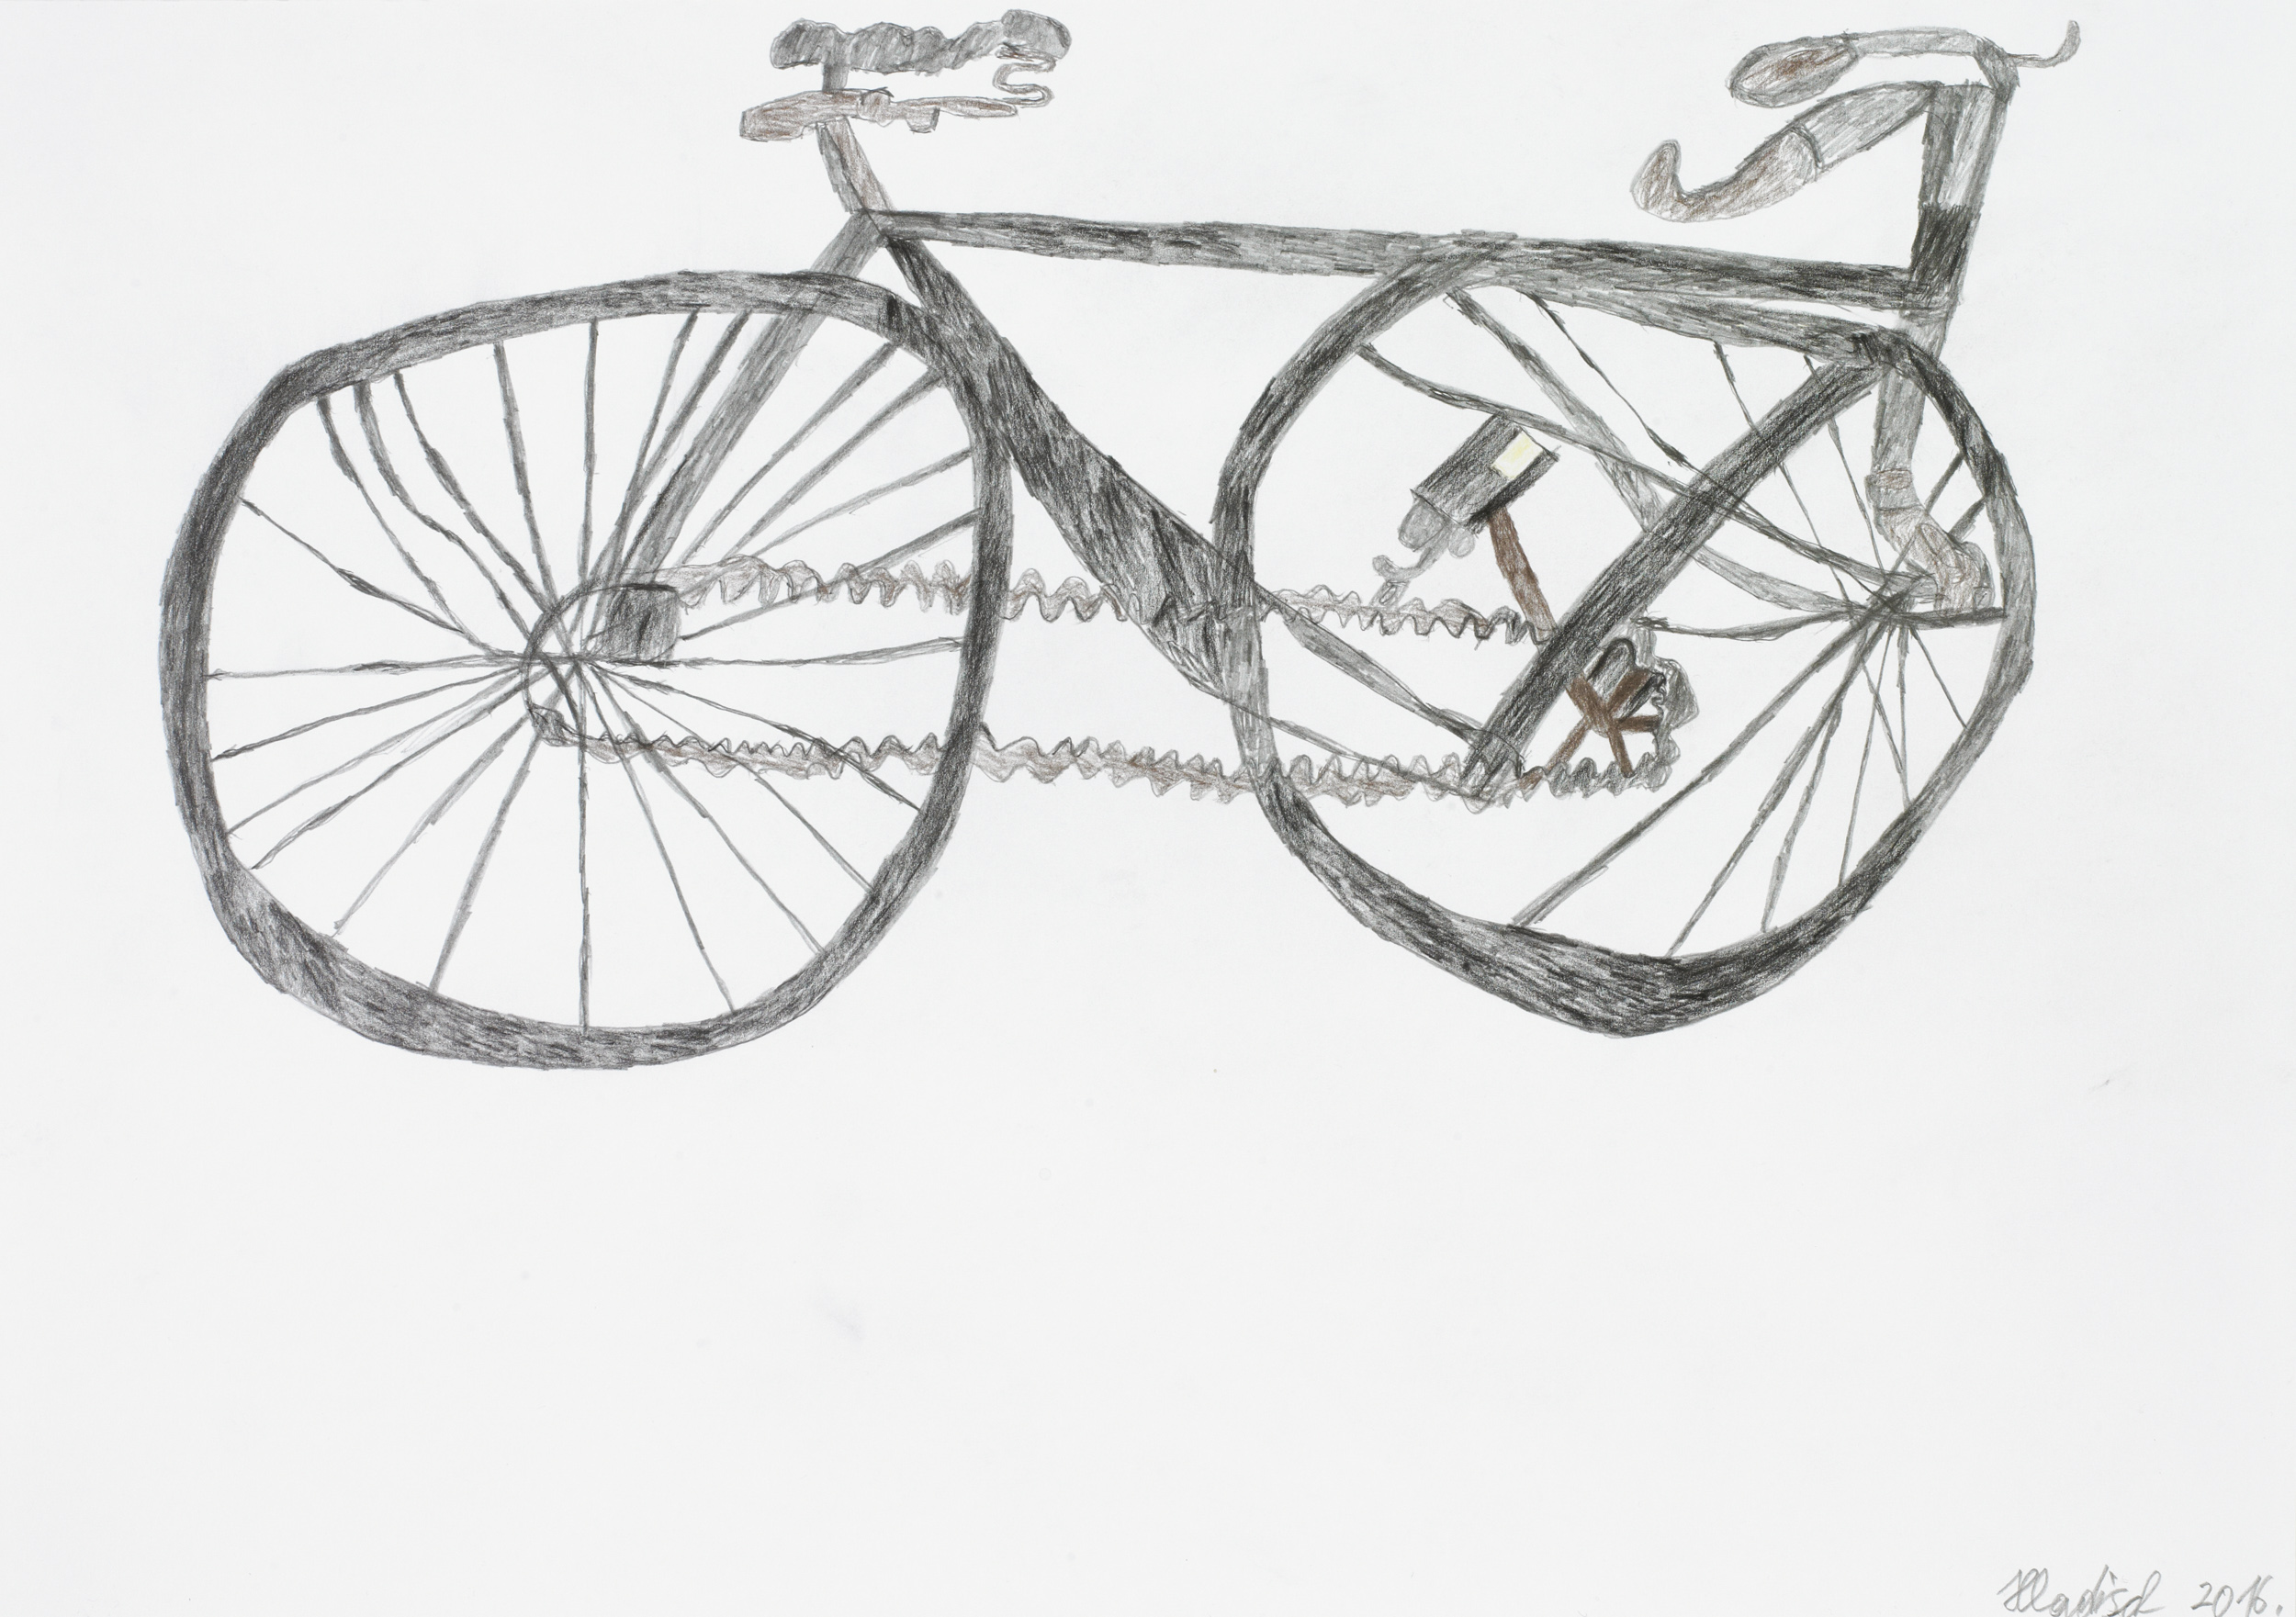 hladisch helmut - Fahrrad / Bicycle